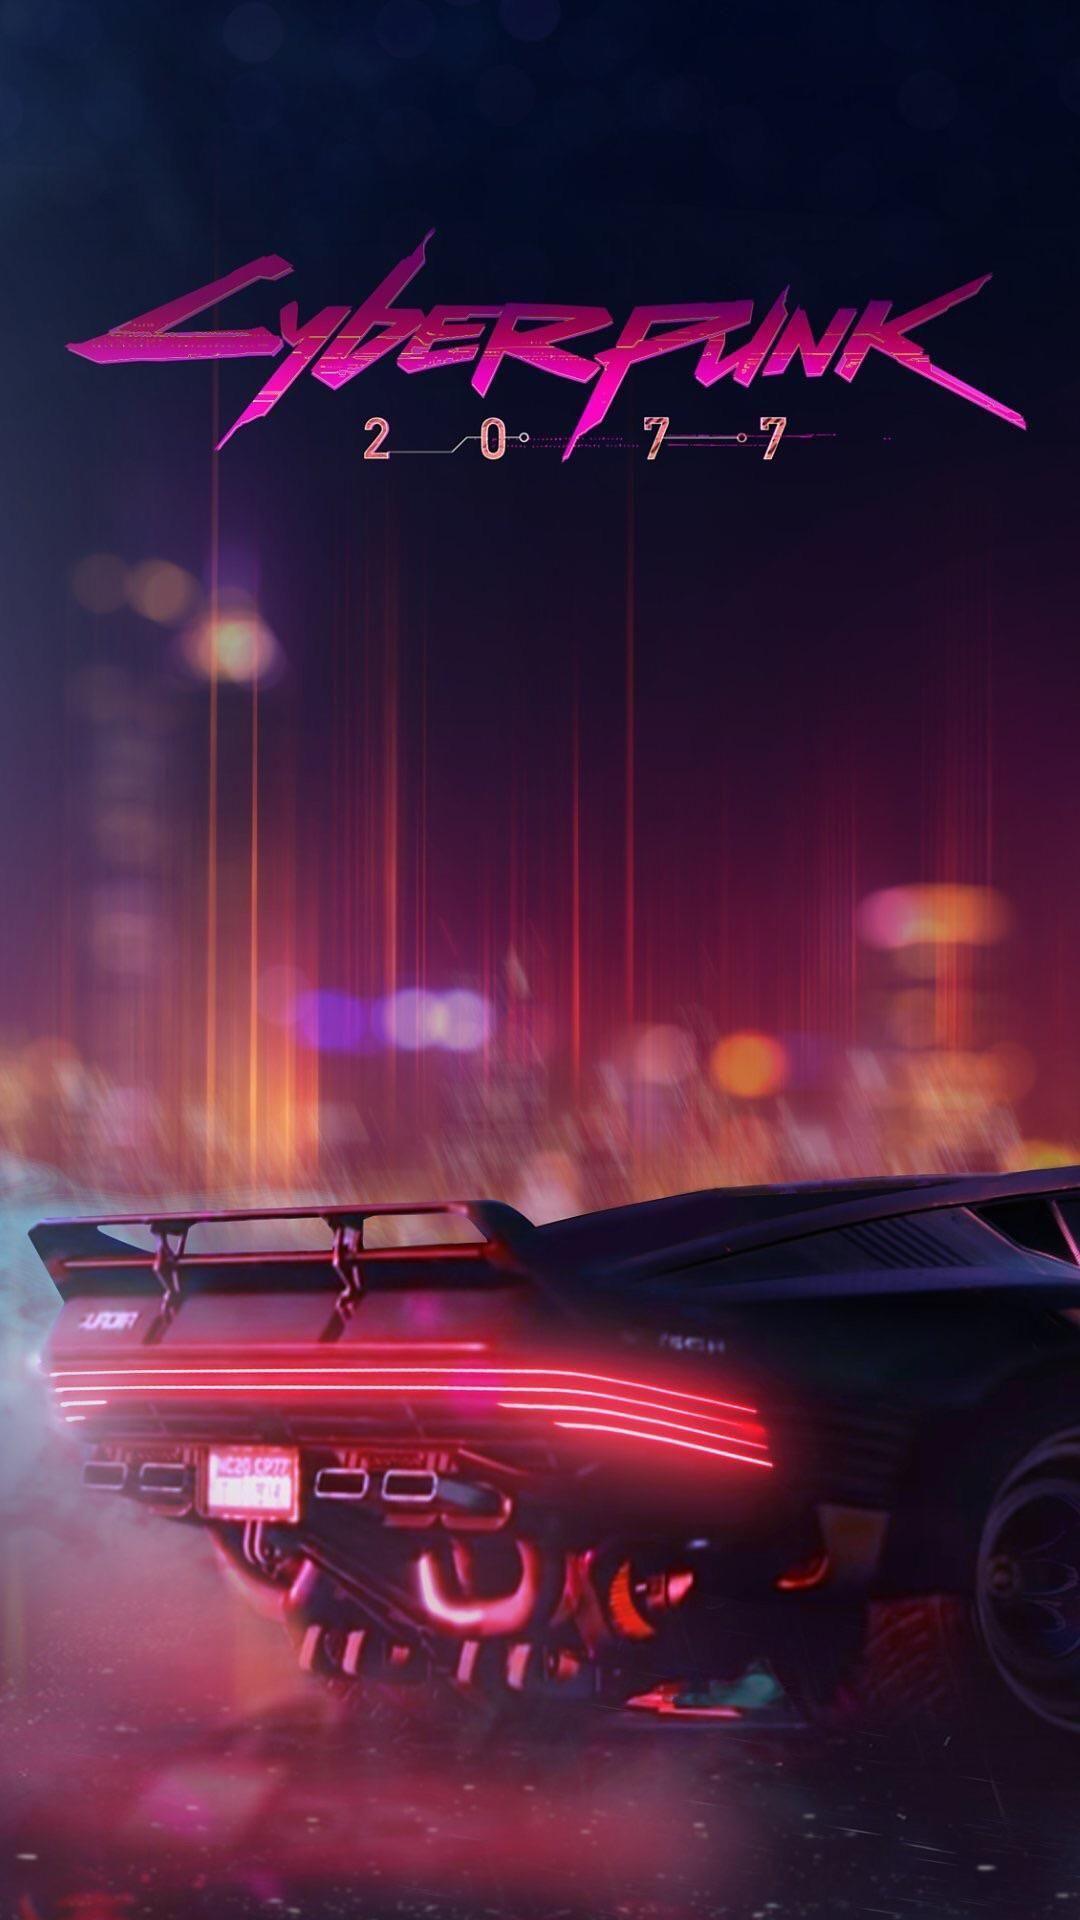 Cyberpunk 2077 wallpapers, Video Game, HQ Cyberpunk 2077...